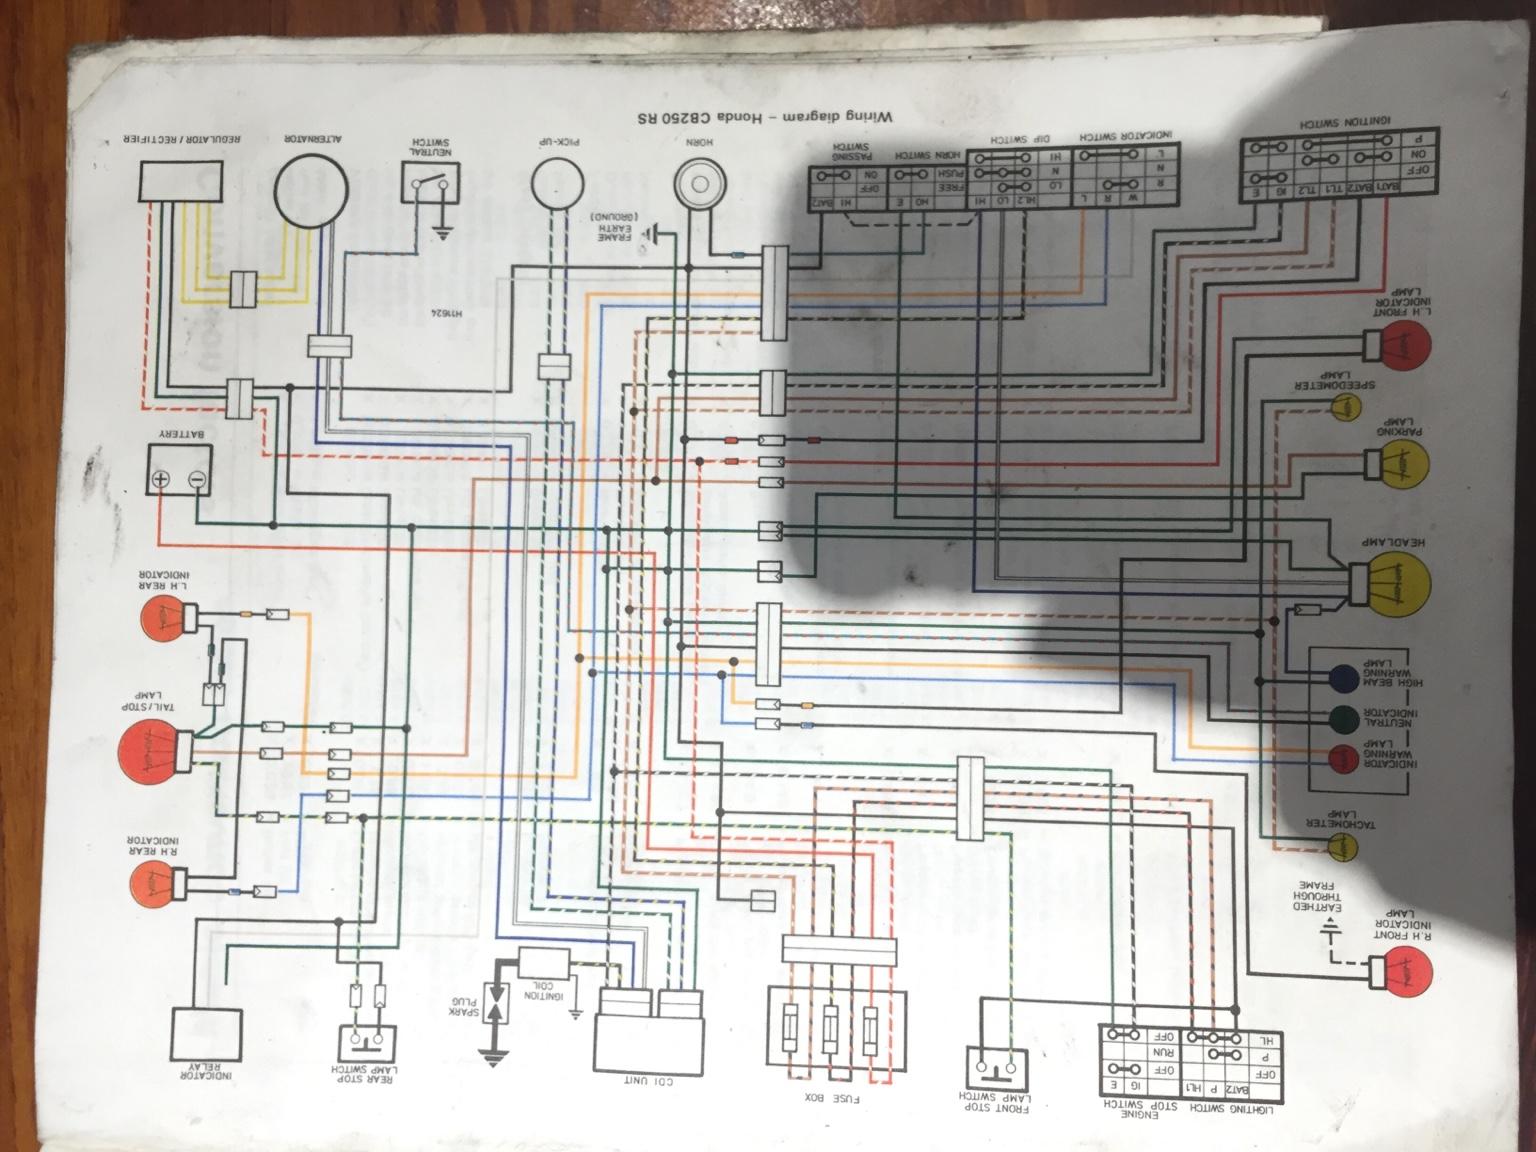 Cool Pamco Ignition Wiring Diagram Free Image Wiring Diagram Engine Wiring 101 Kwecapipaaccommodationcom